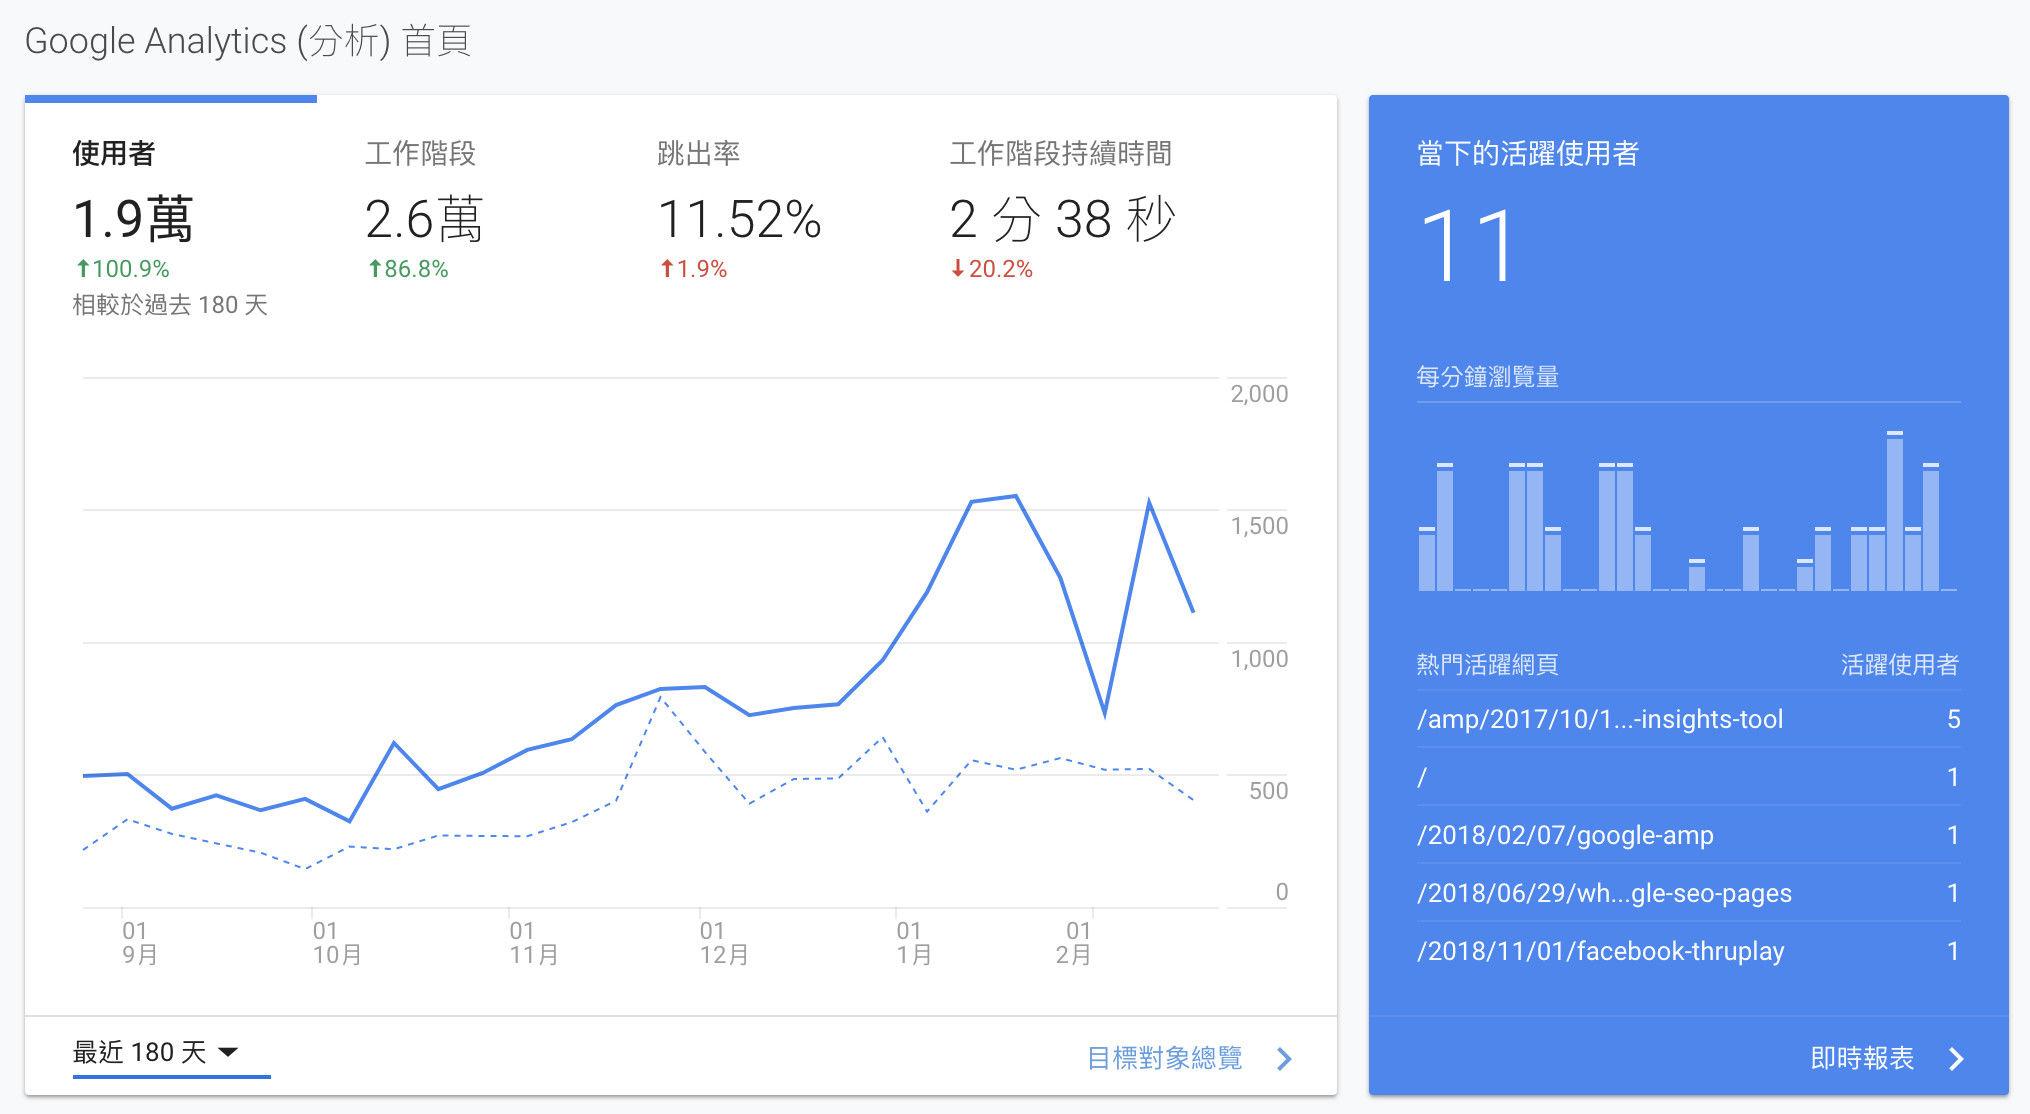 Google Analytics網站流量分析工具首頁-鯊客科技網站SEO優化公司